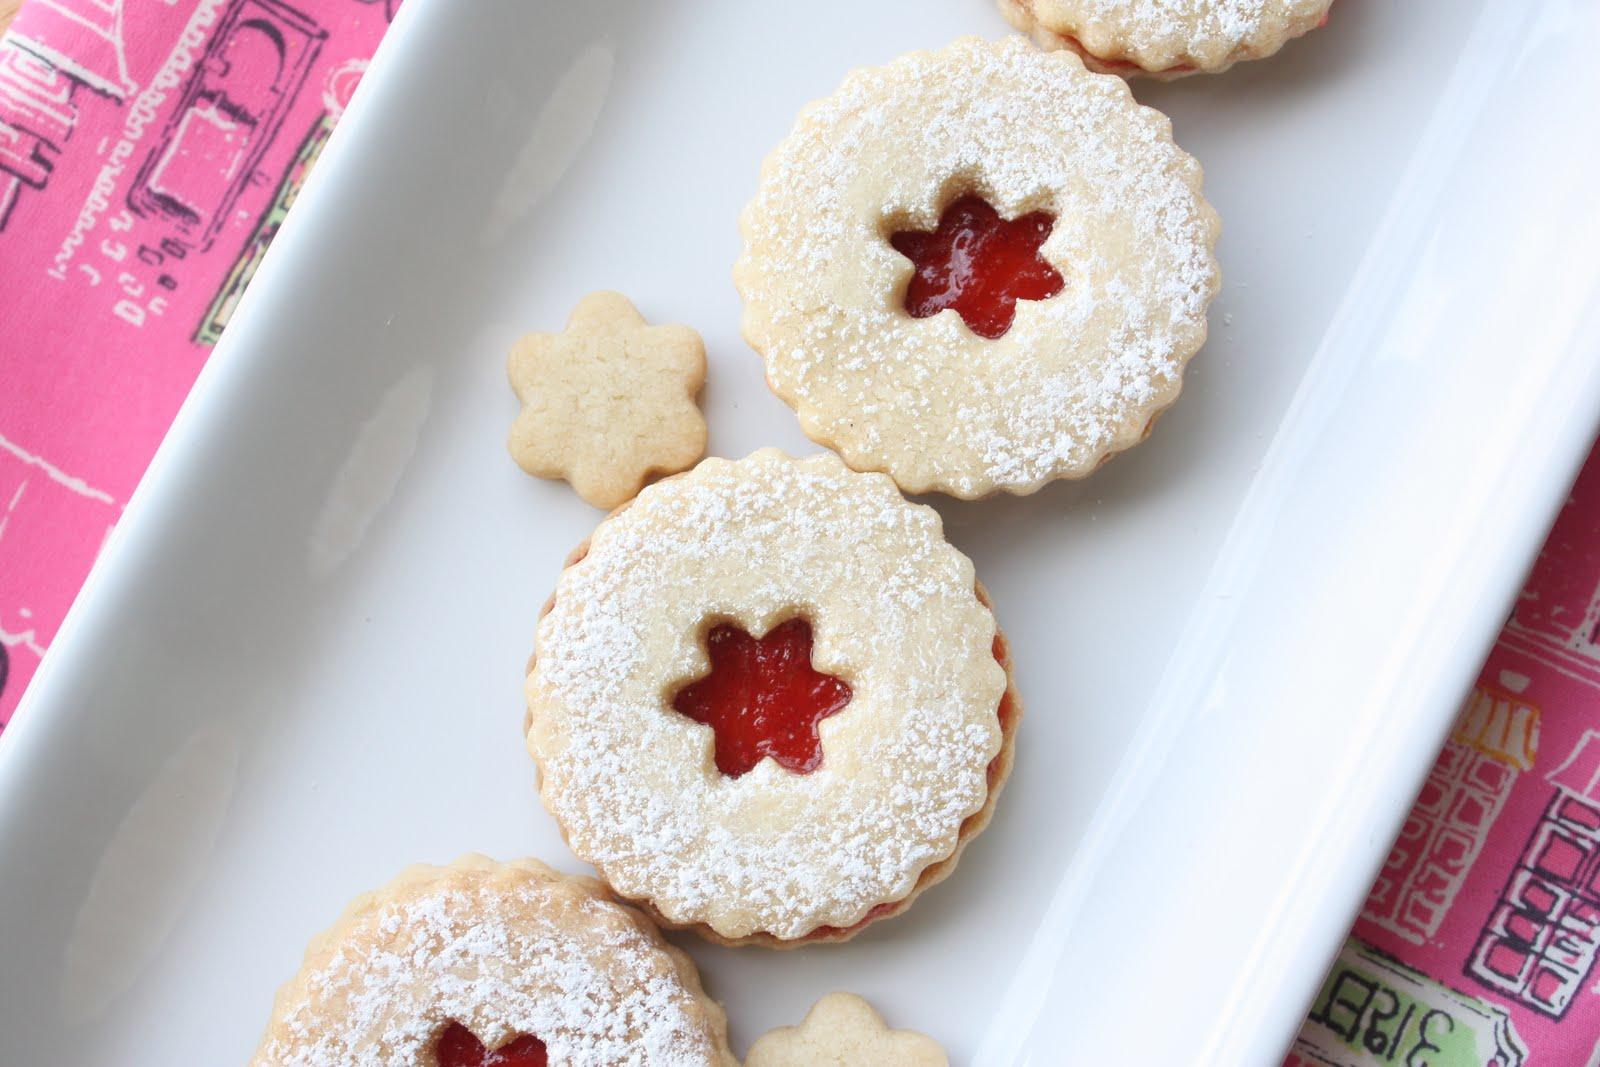 Munchkin Munchies: Strawberry Jam, Linzer Cookies, and Giveaway WINNER!